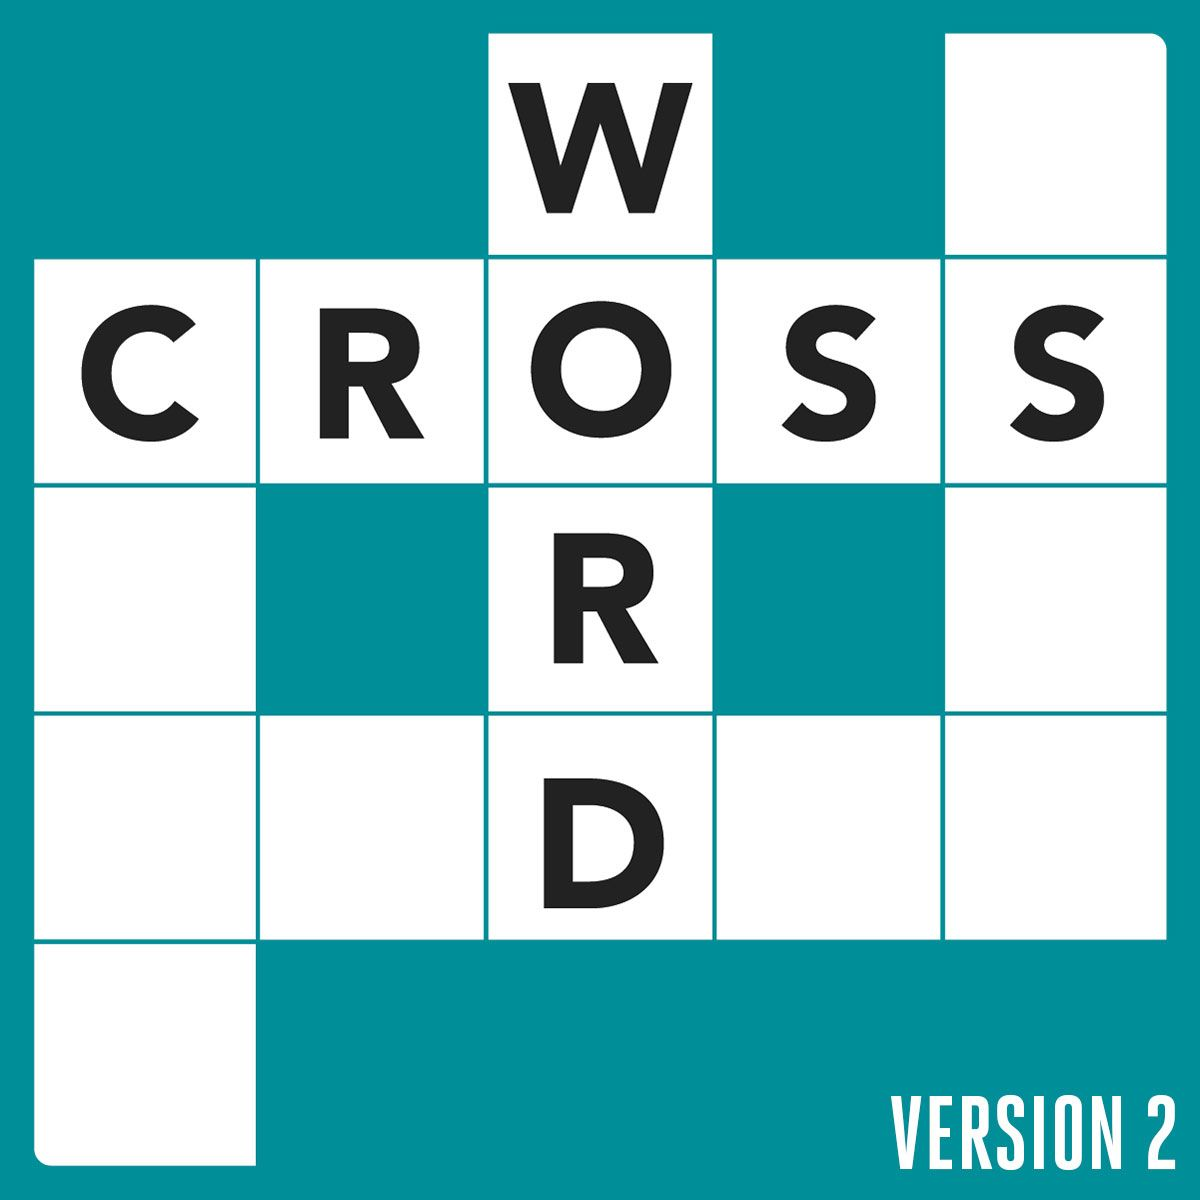 Cross-V2